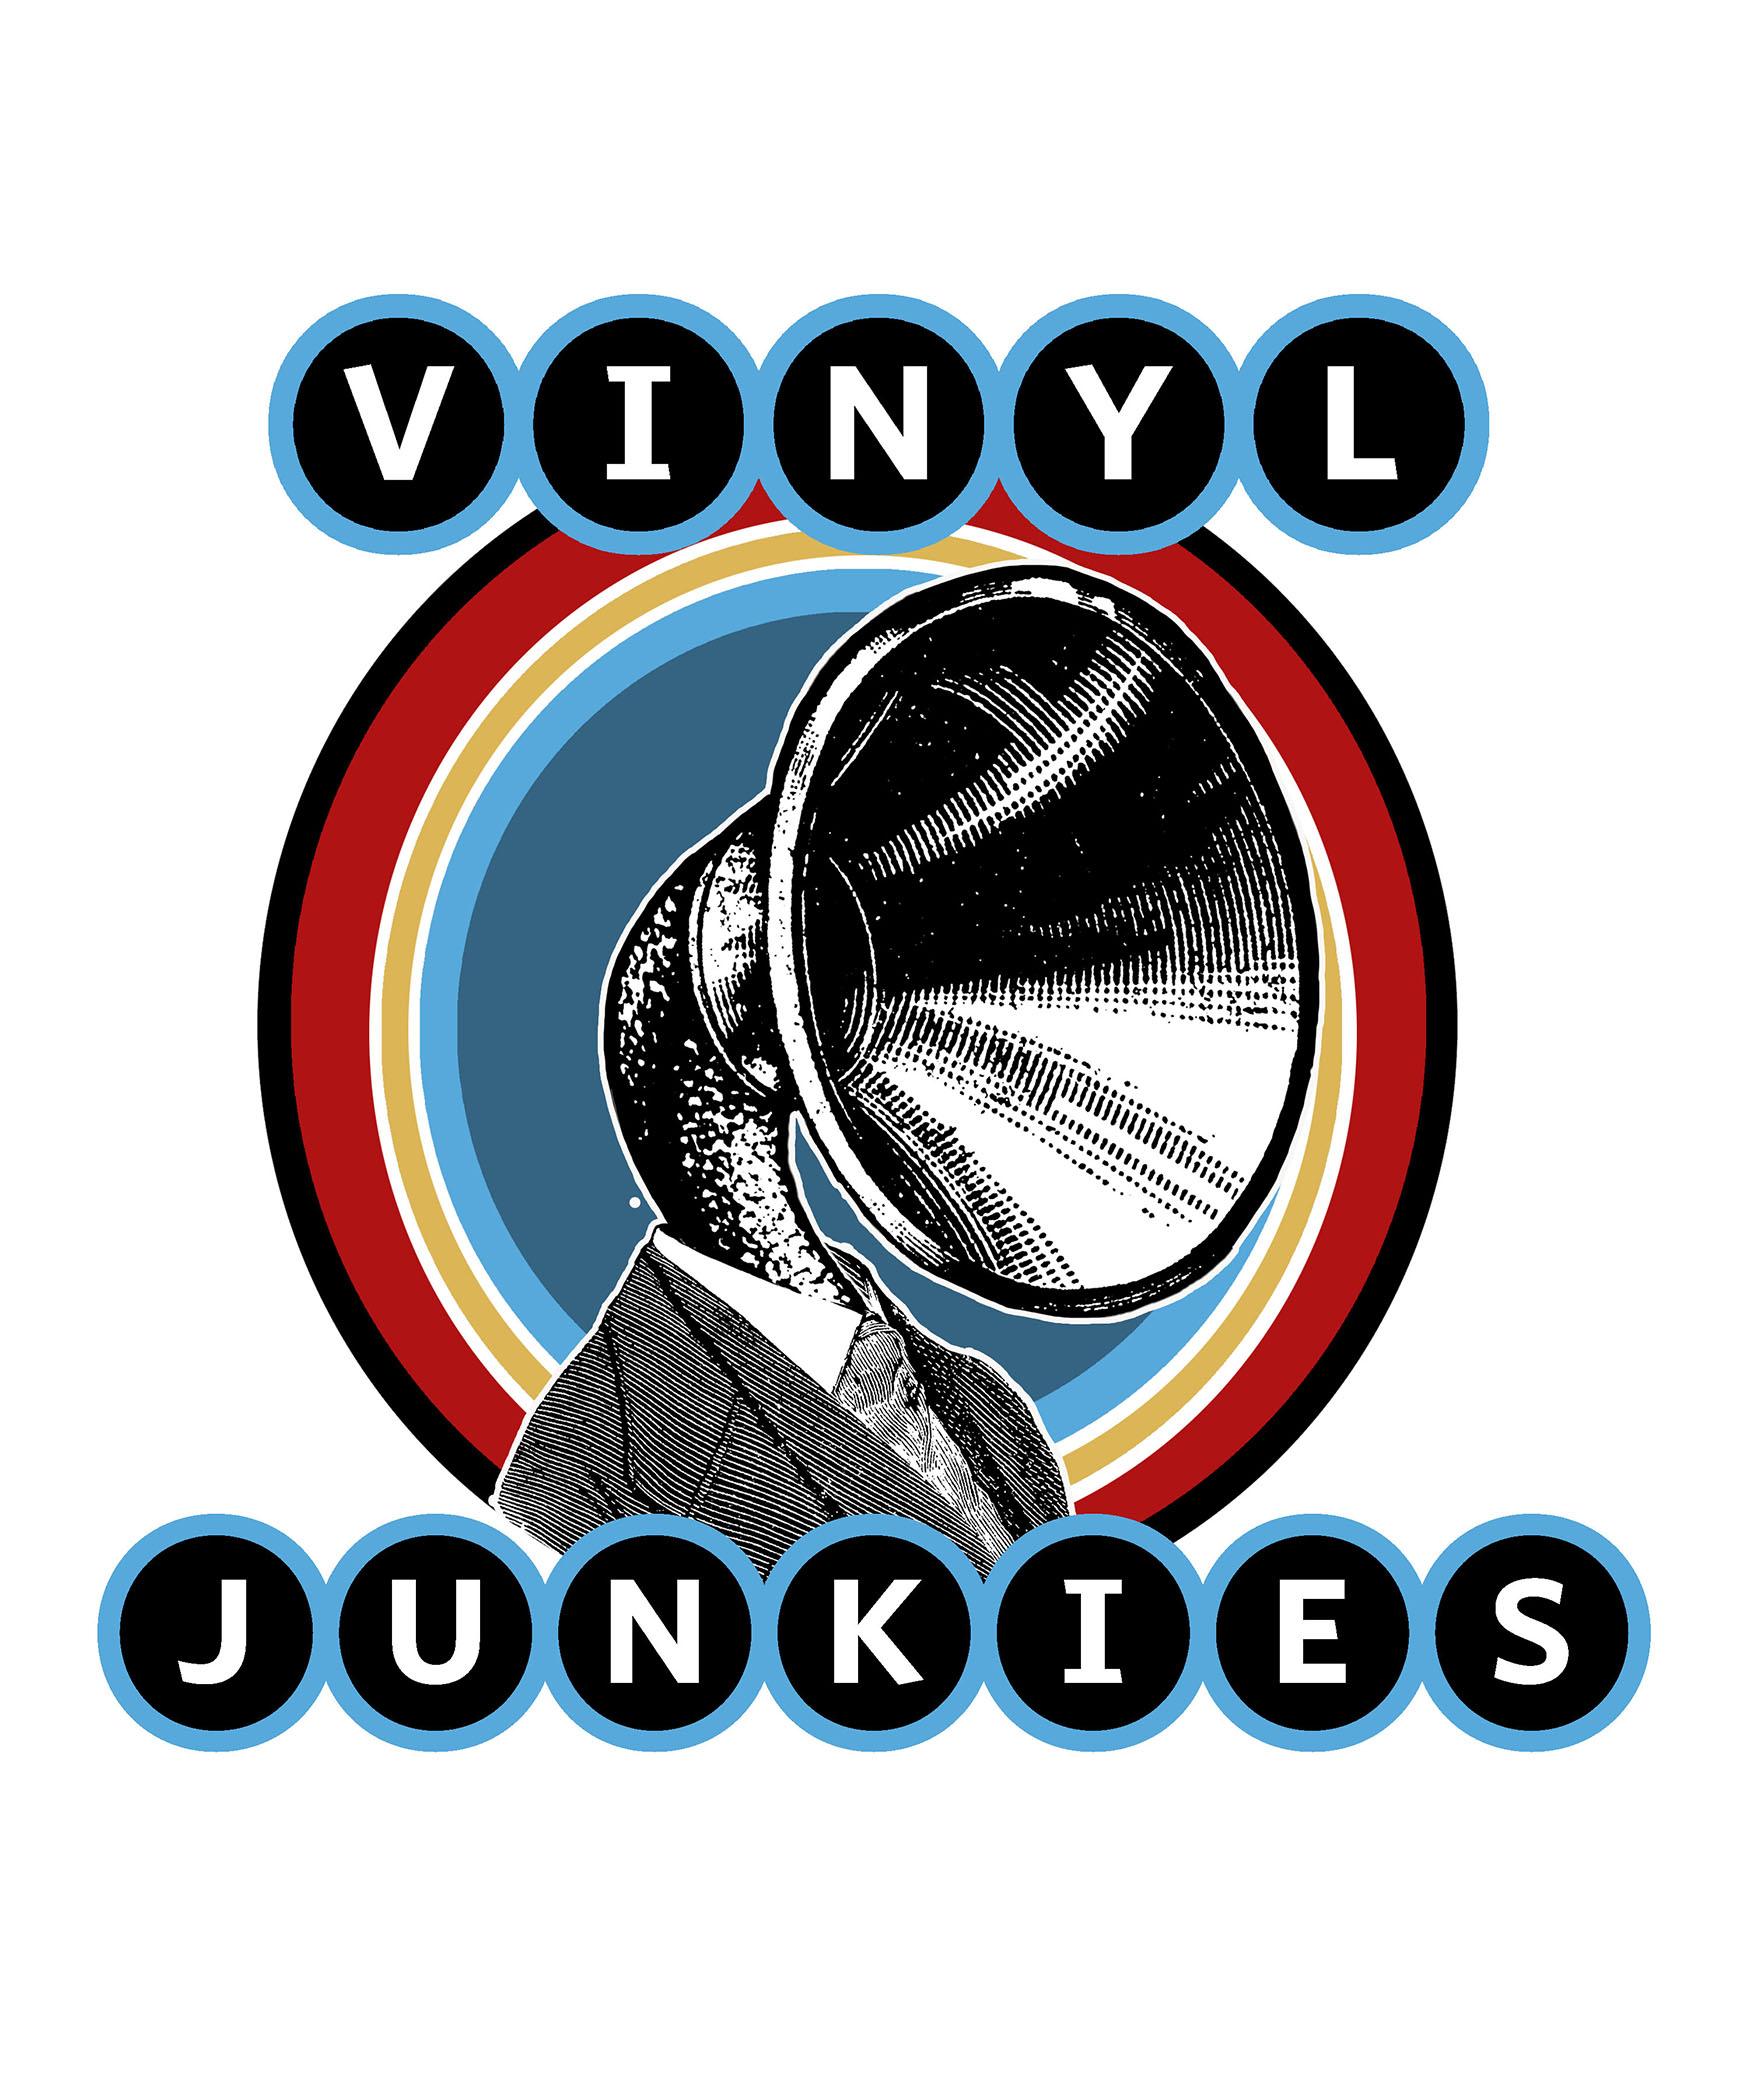 Artwork for Vinyl Junkies Vs. Run Out Groove